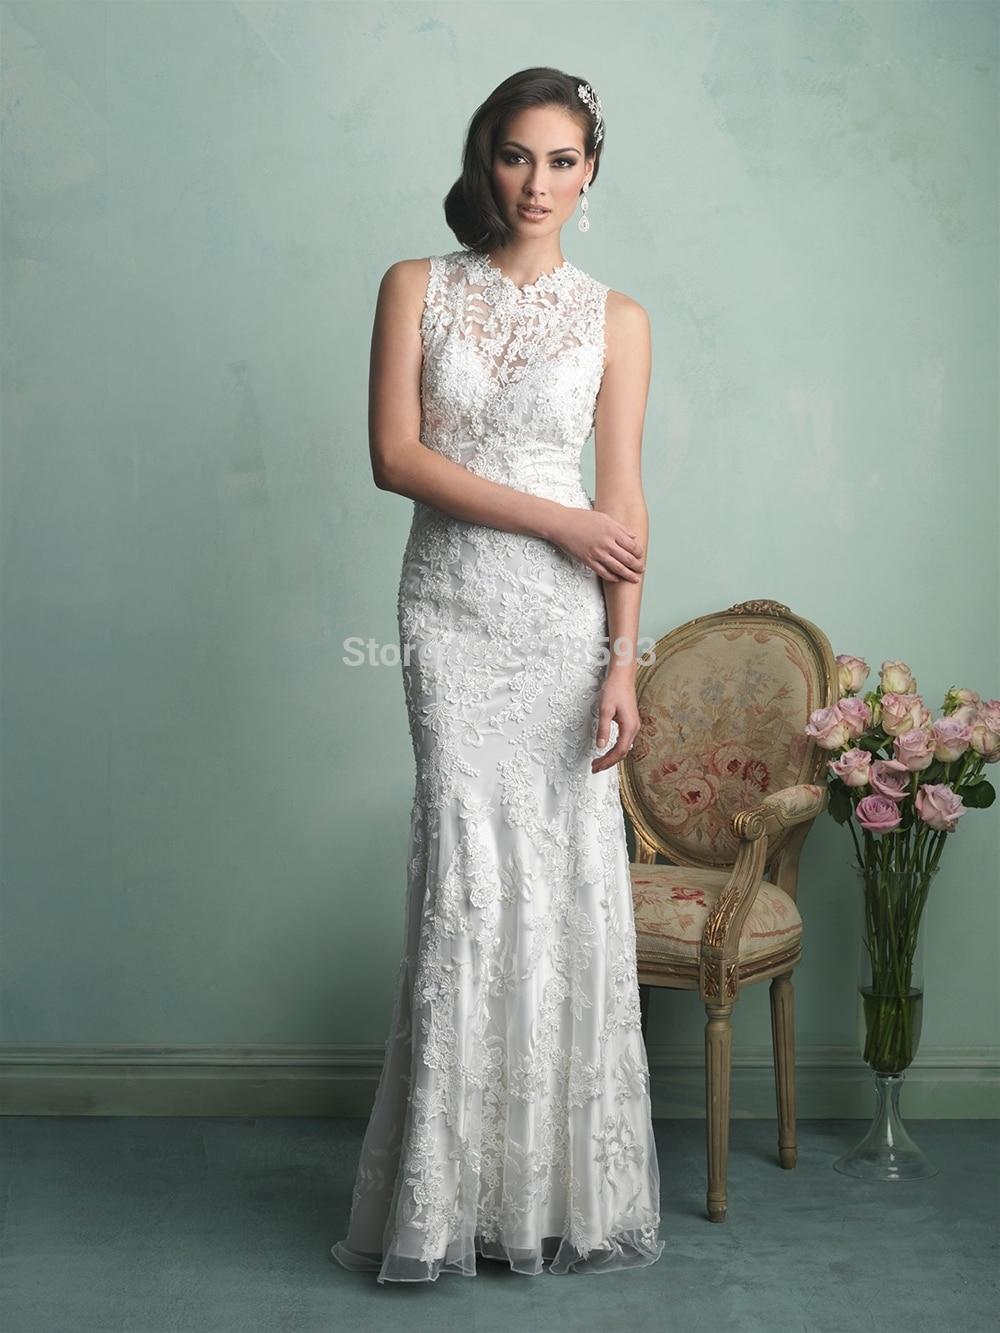 Short Casual Wedding Dresses Satin Second Dress Beachy Bohemian ...